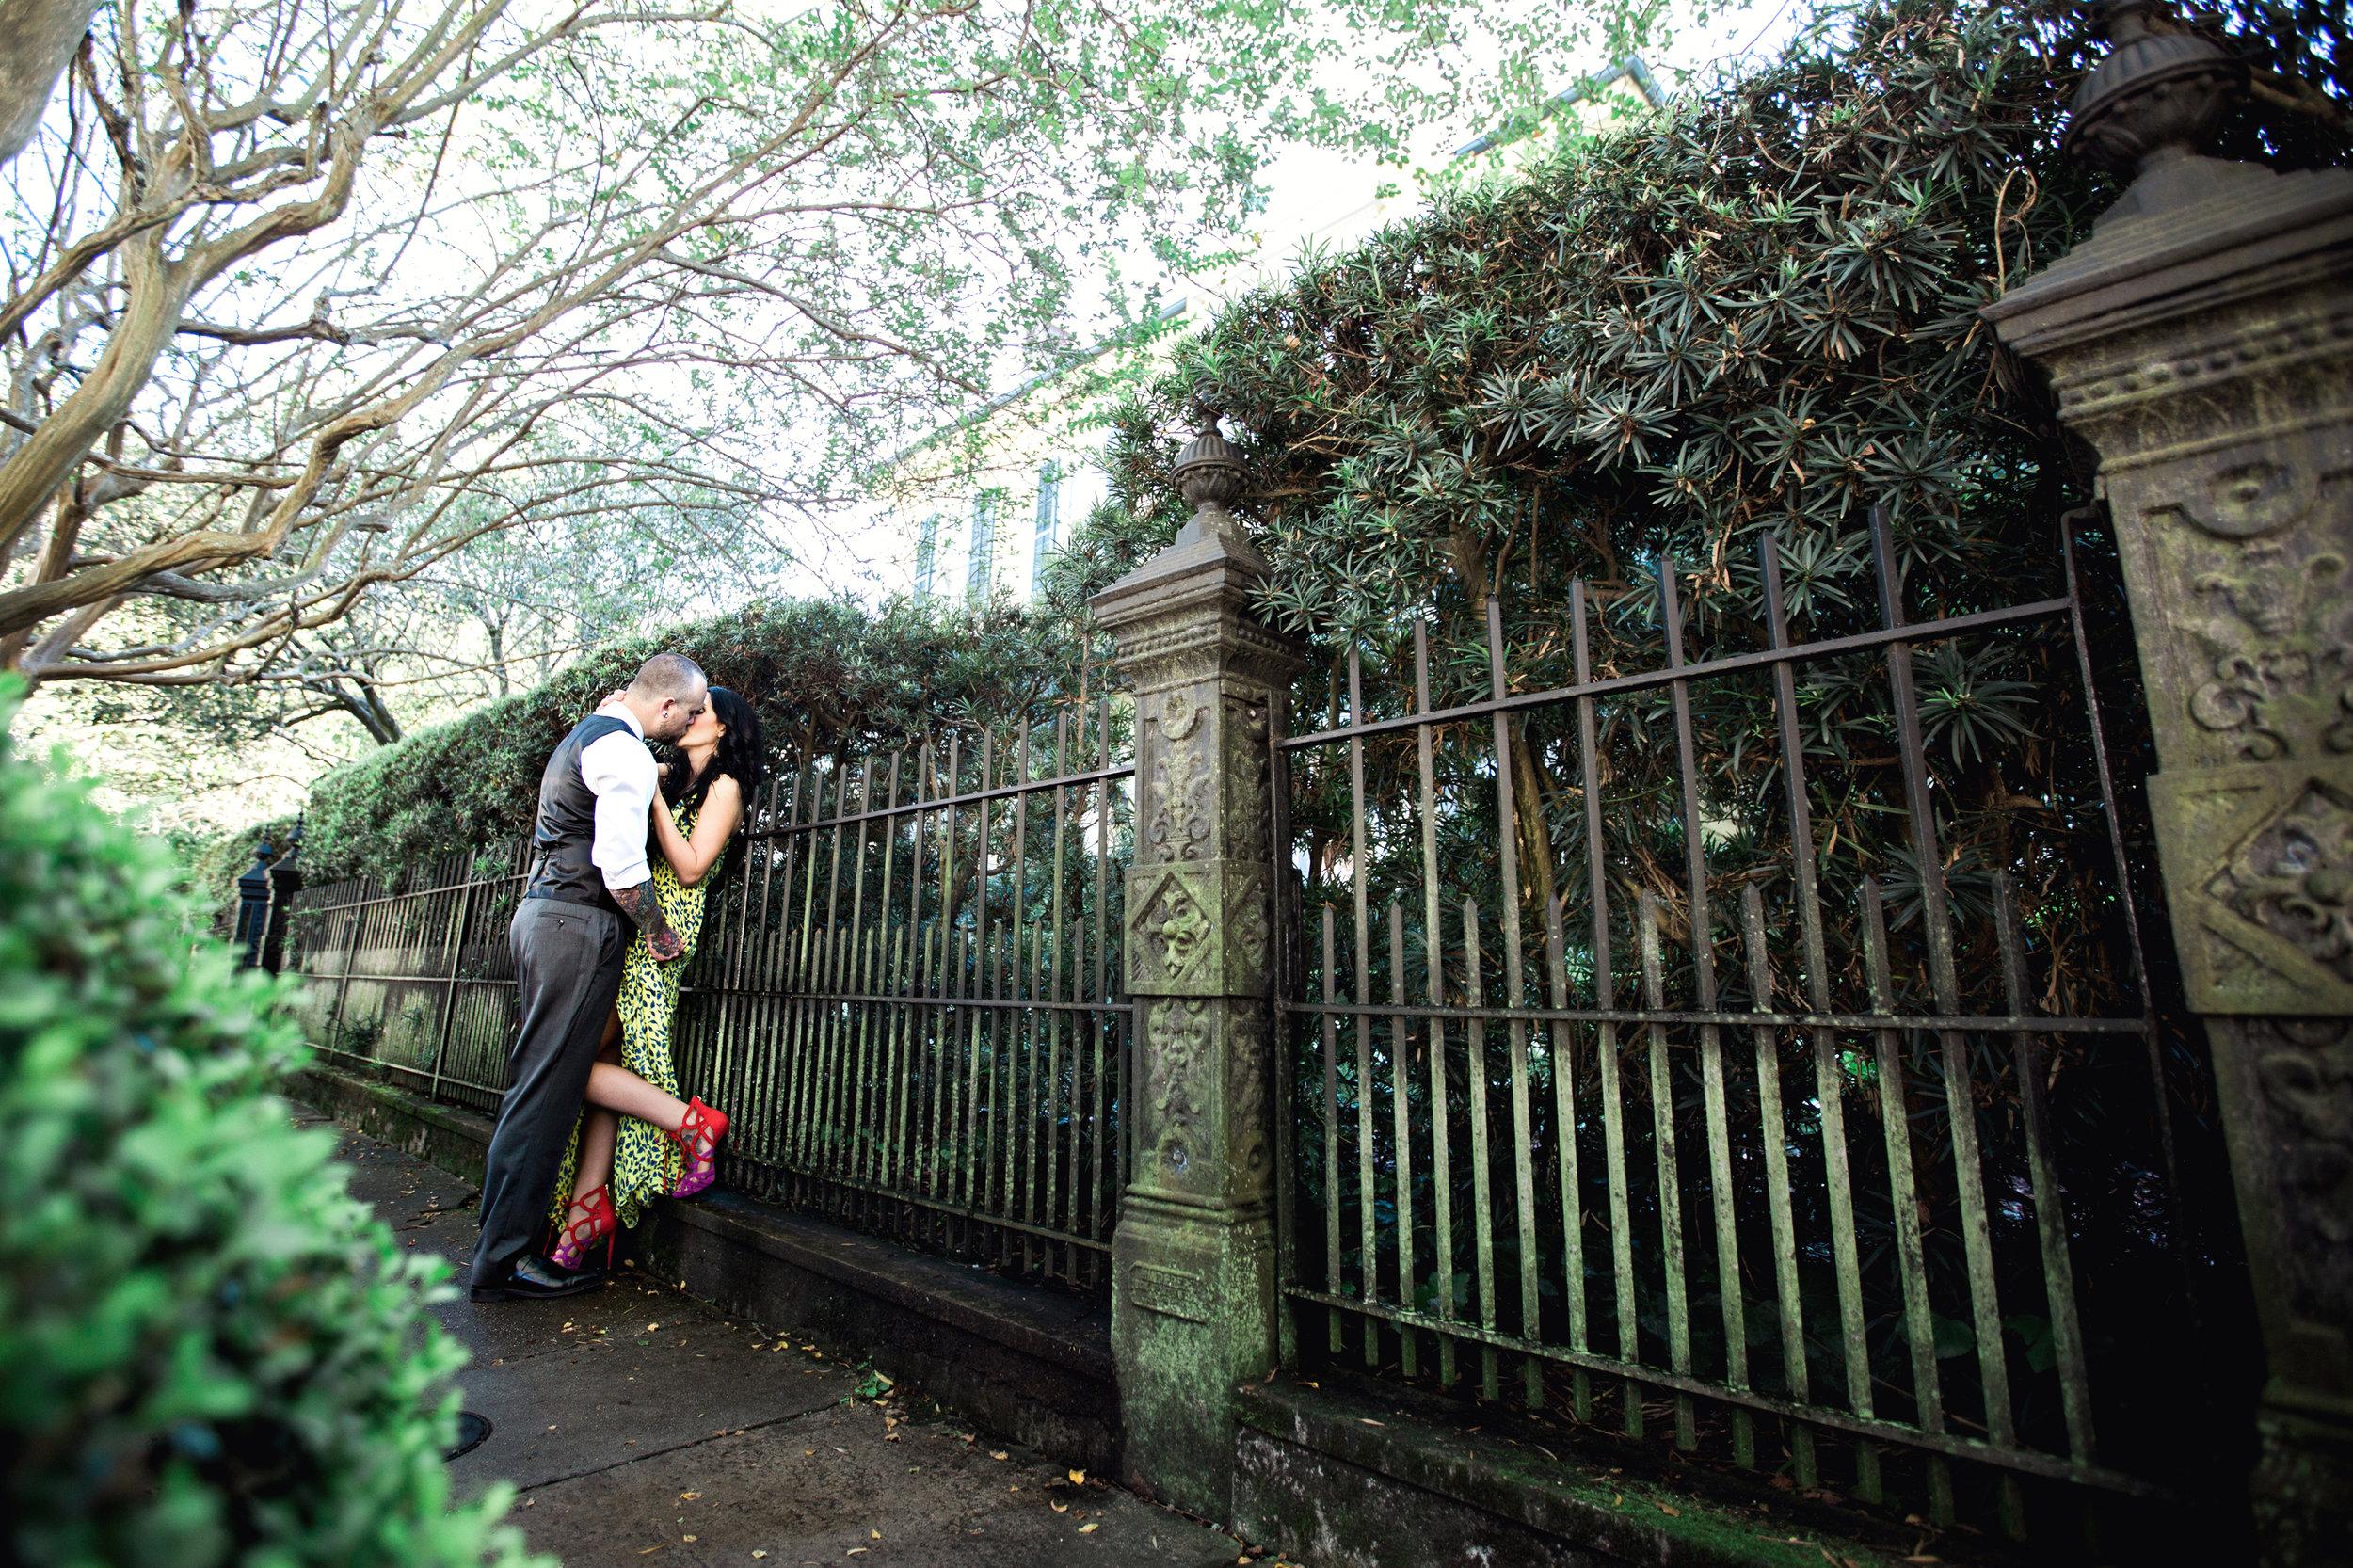 CindyGiovagnoliPhotography_Seattle_Washington_PNW_Couple_Engagement_Portrait_Photography-025.jpg